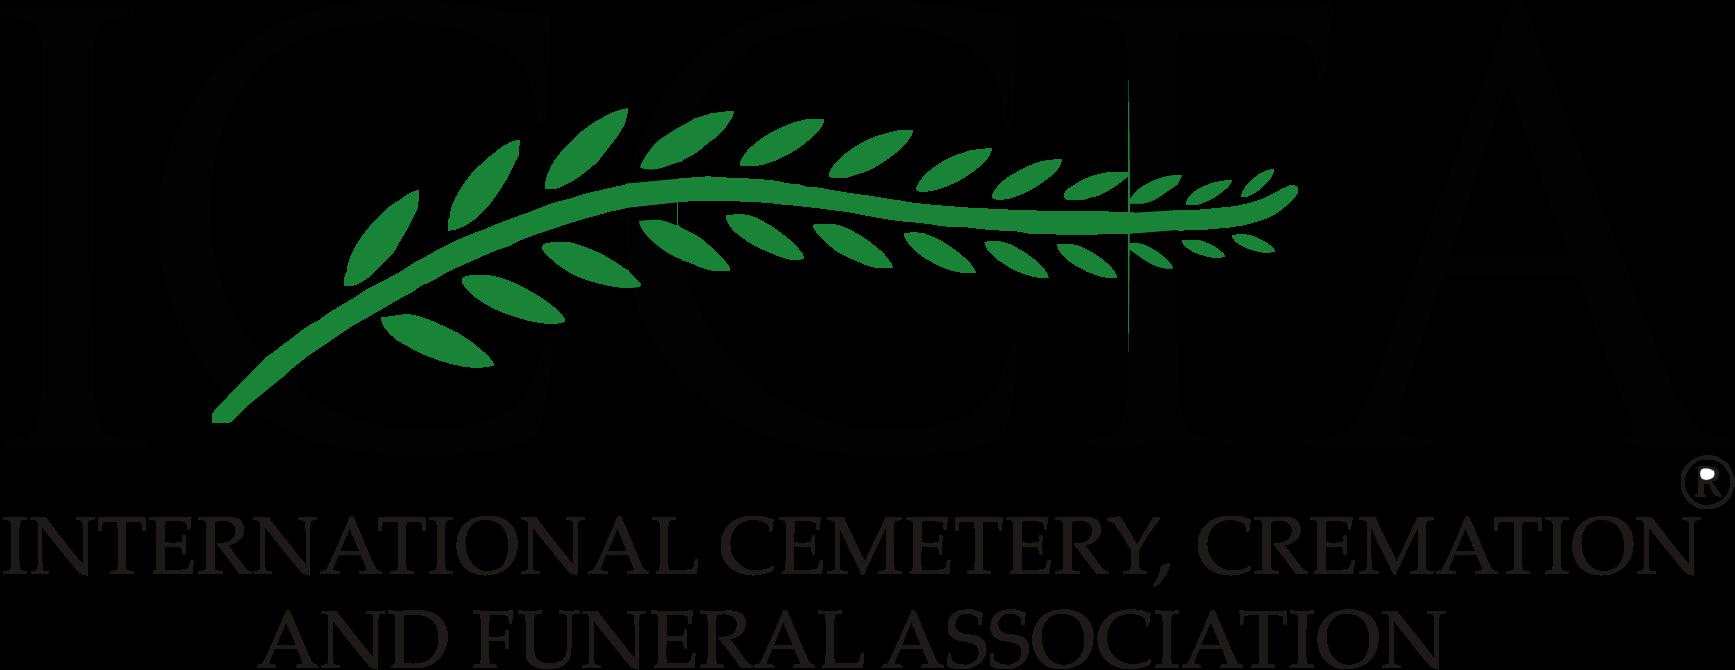 ICCTA Logo